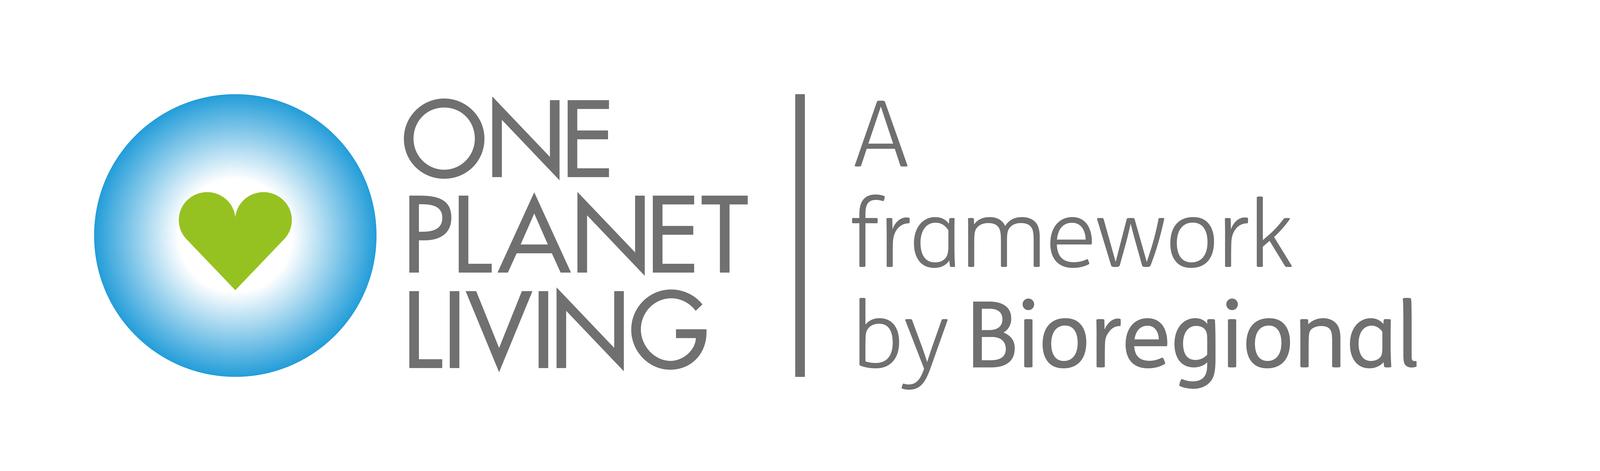 One Planet Living logo